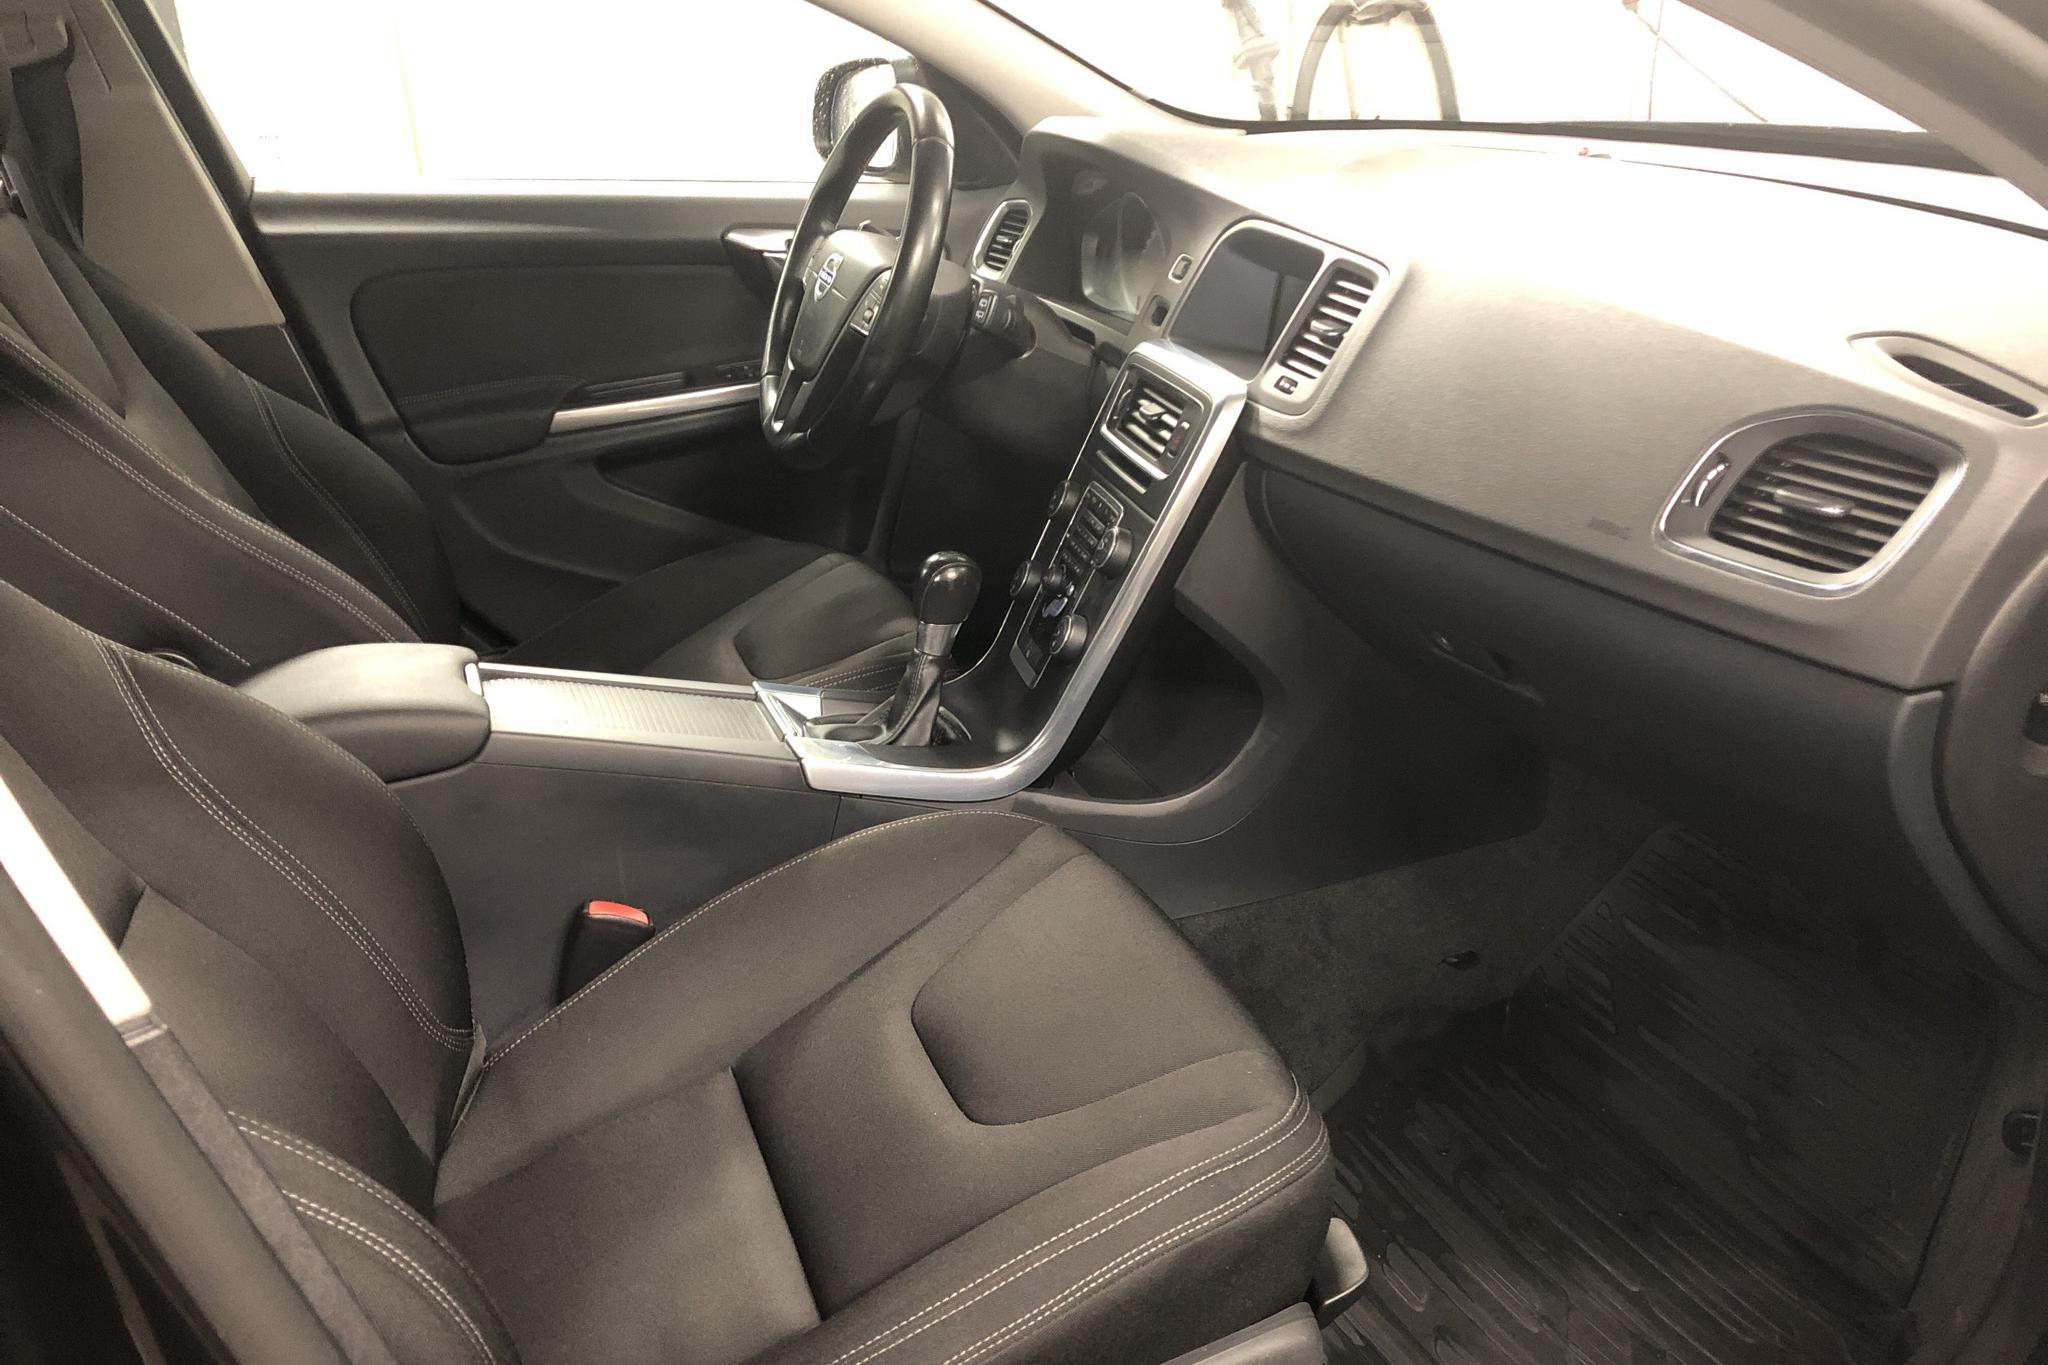 Volvo V60 D2 (115hk) - 12 893 mil - Manuell - svart - 2014